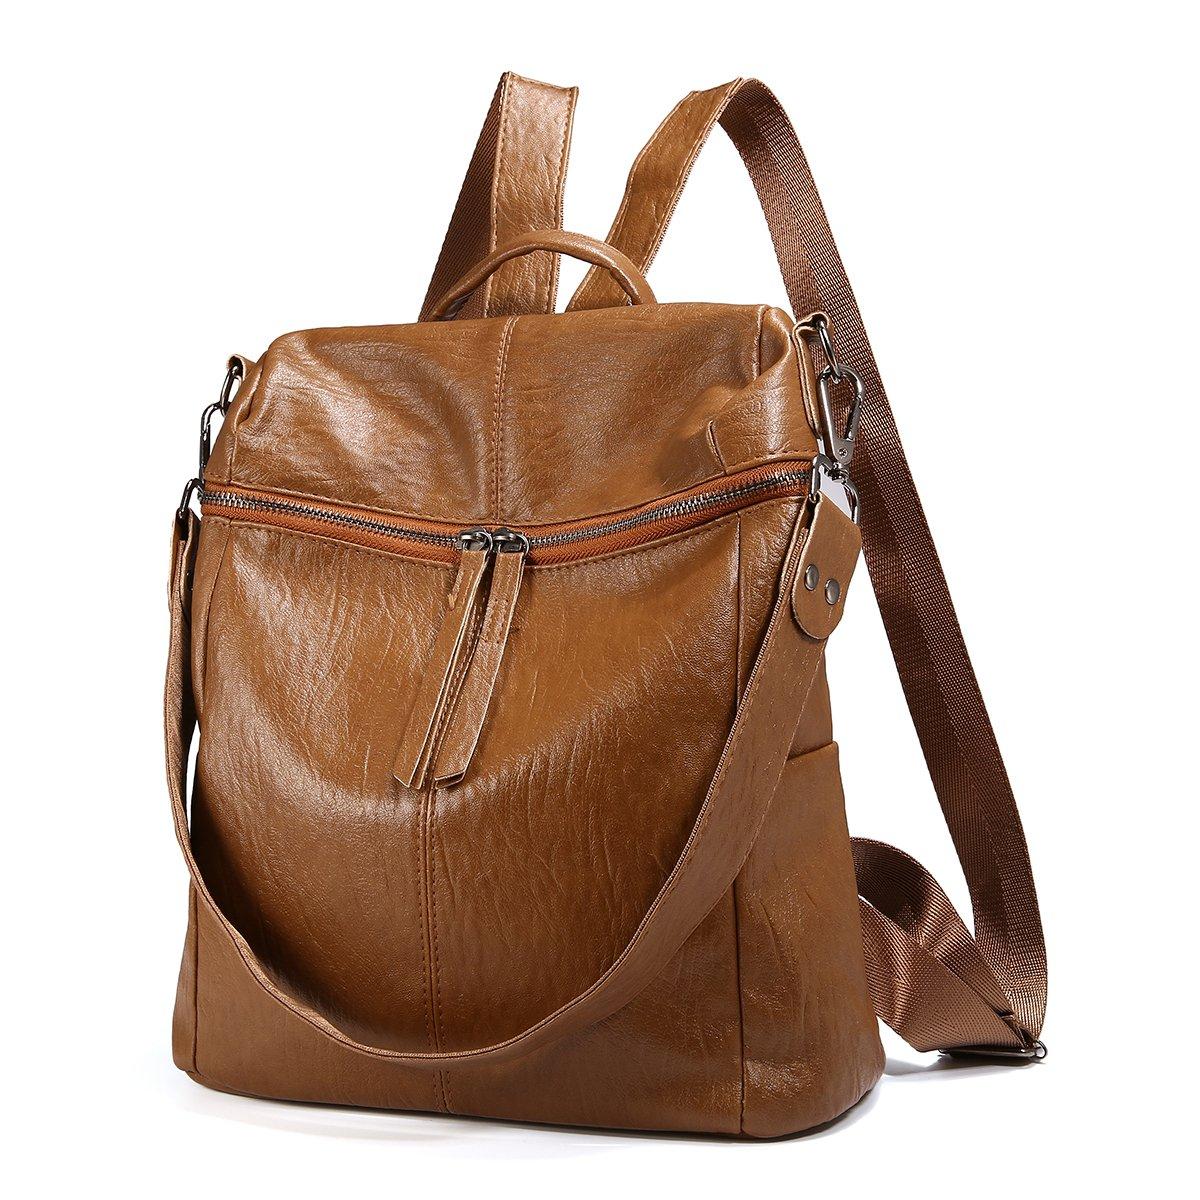 JOSEKO Fashion Backpack, Women Purse Soft PU Leather Ladies Rucksack Shoulder Bag Handbag Brown 11.8''x 11.02''x 5.9''(LxWxH)